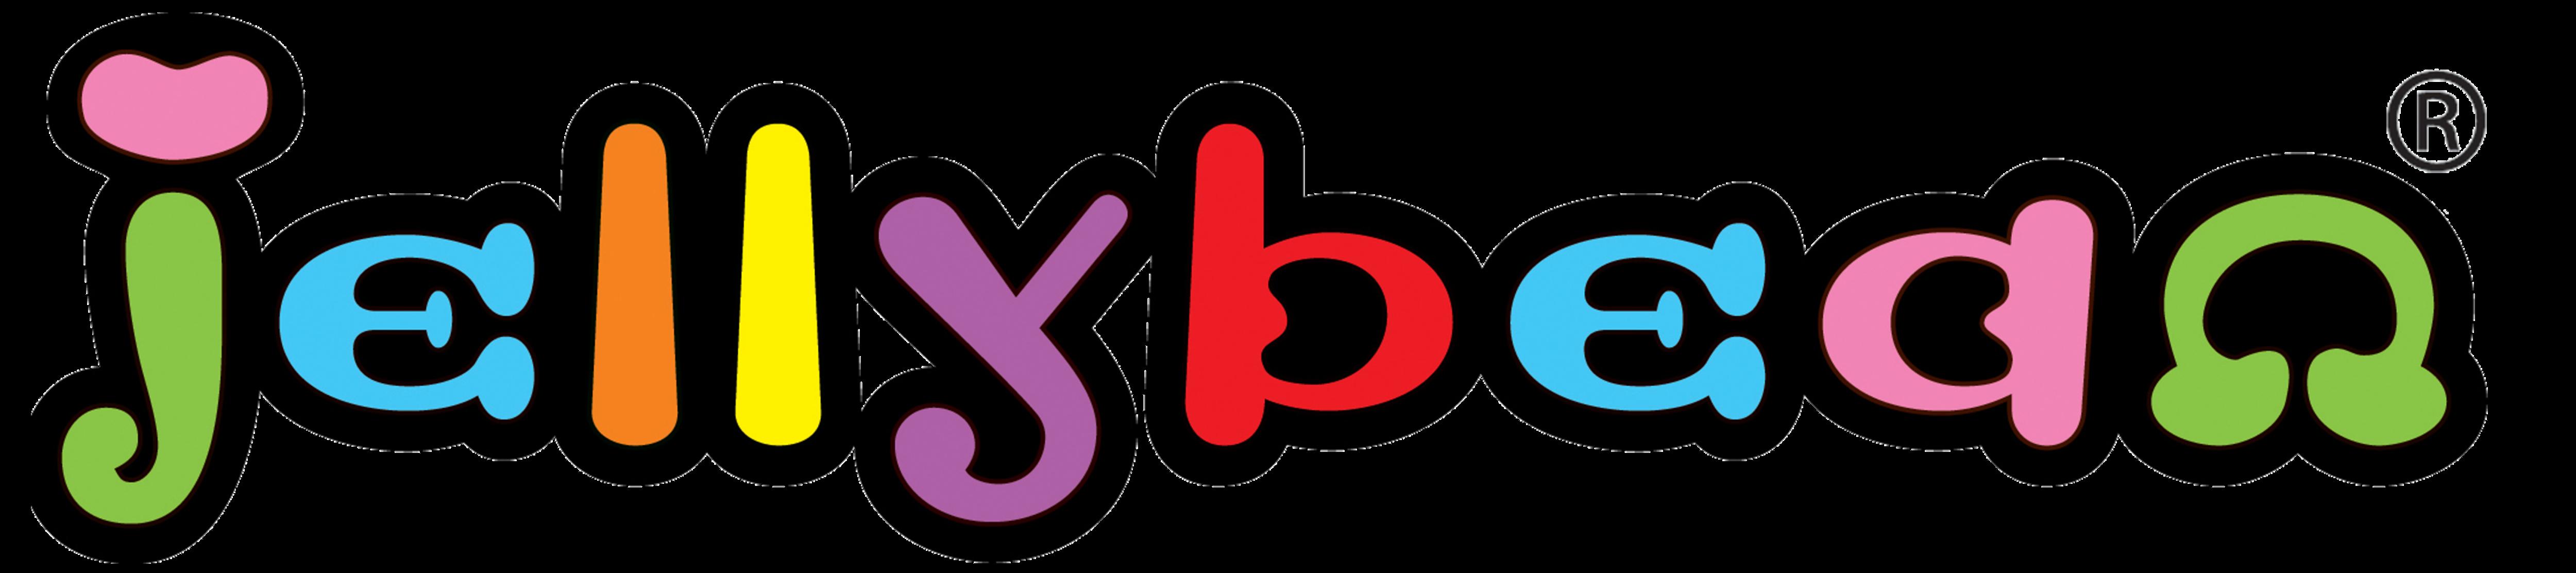 jellybean-registered-logo-description.png